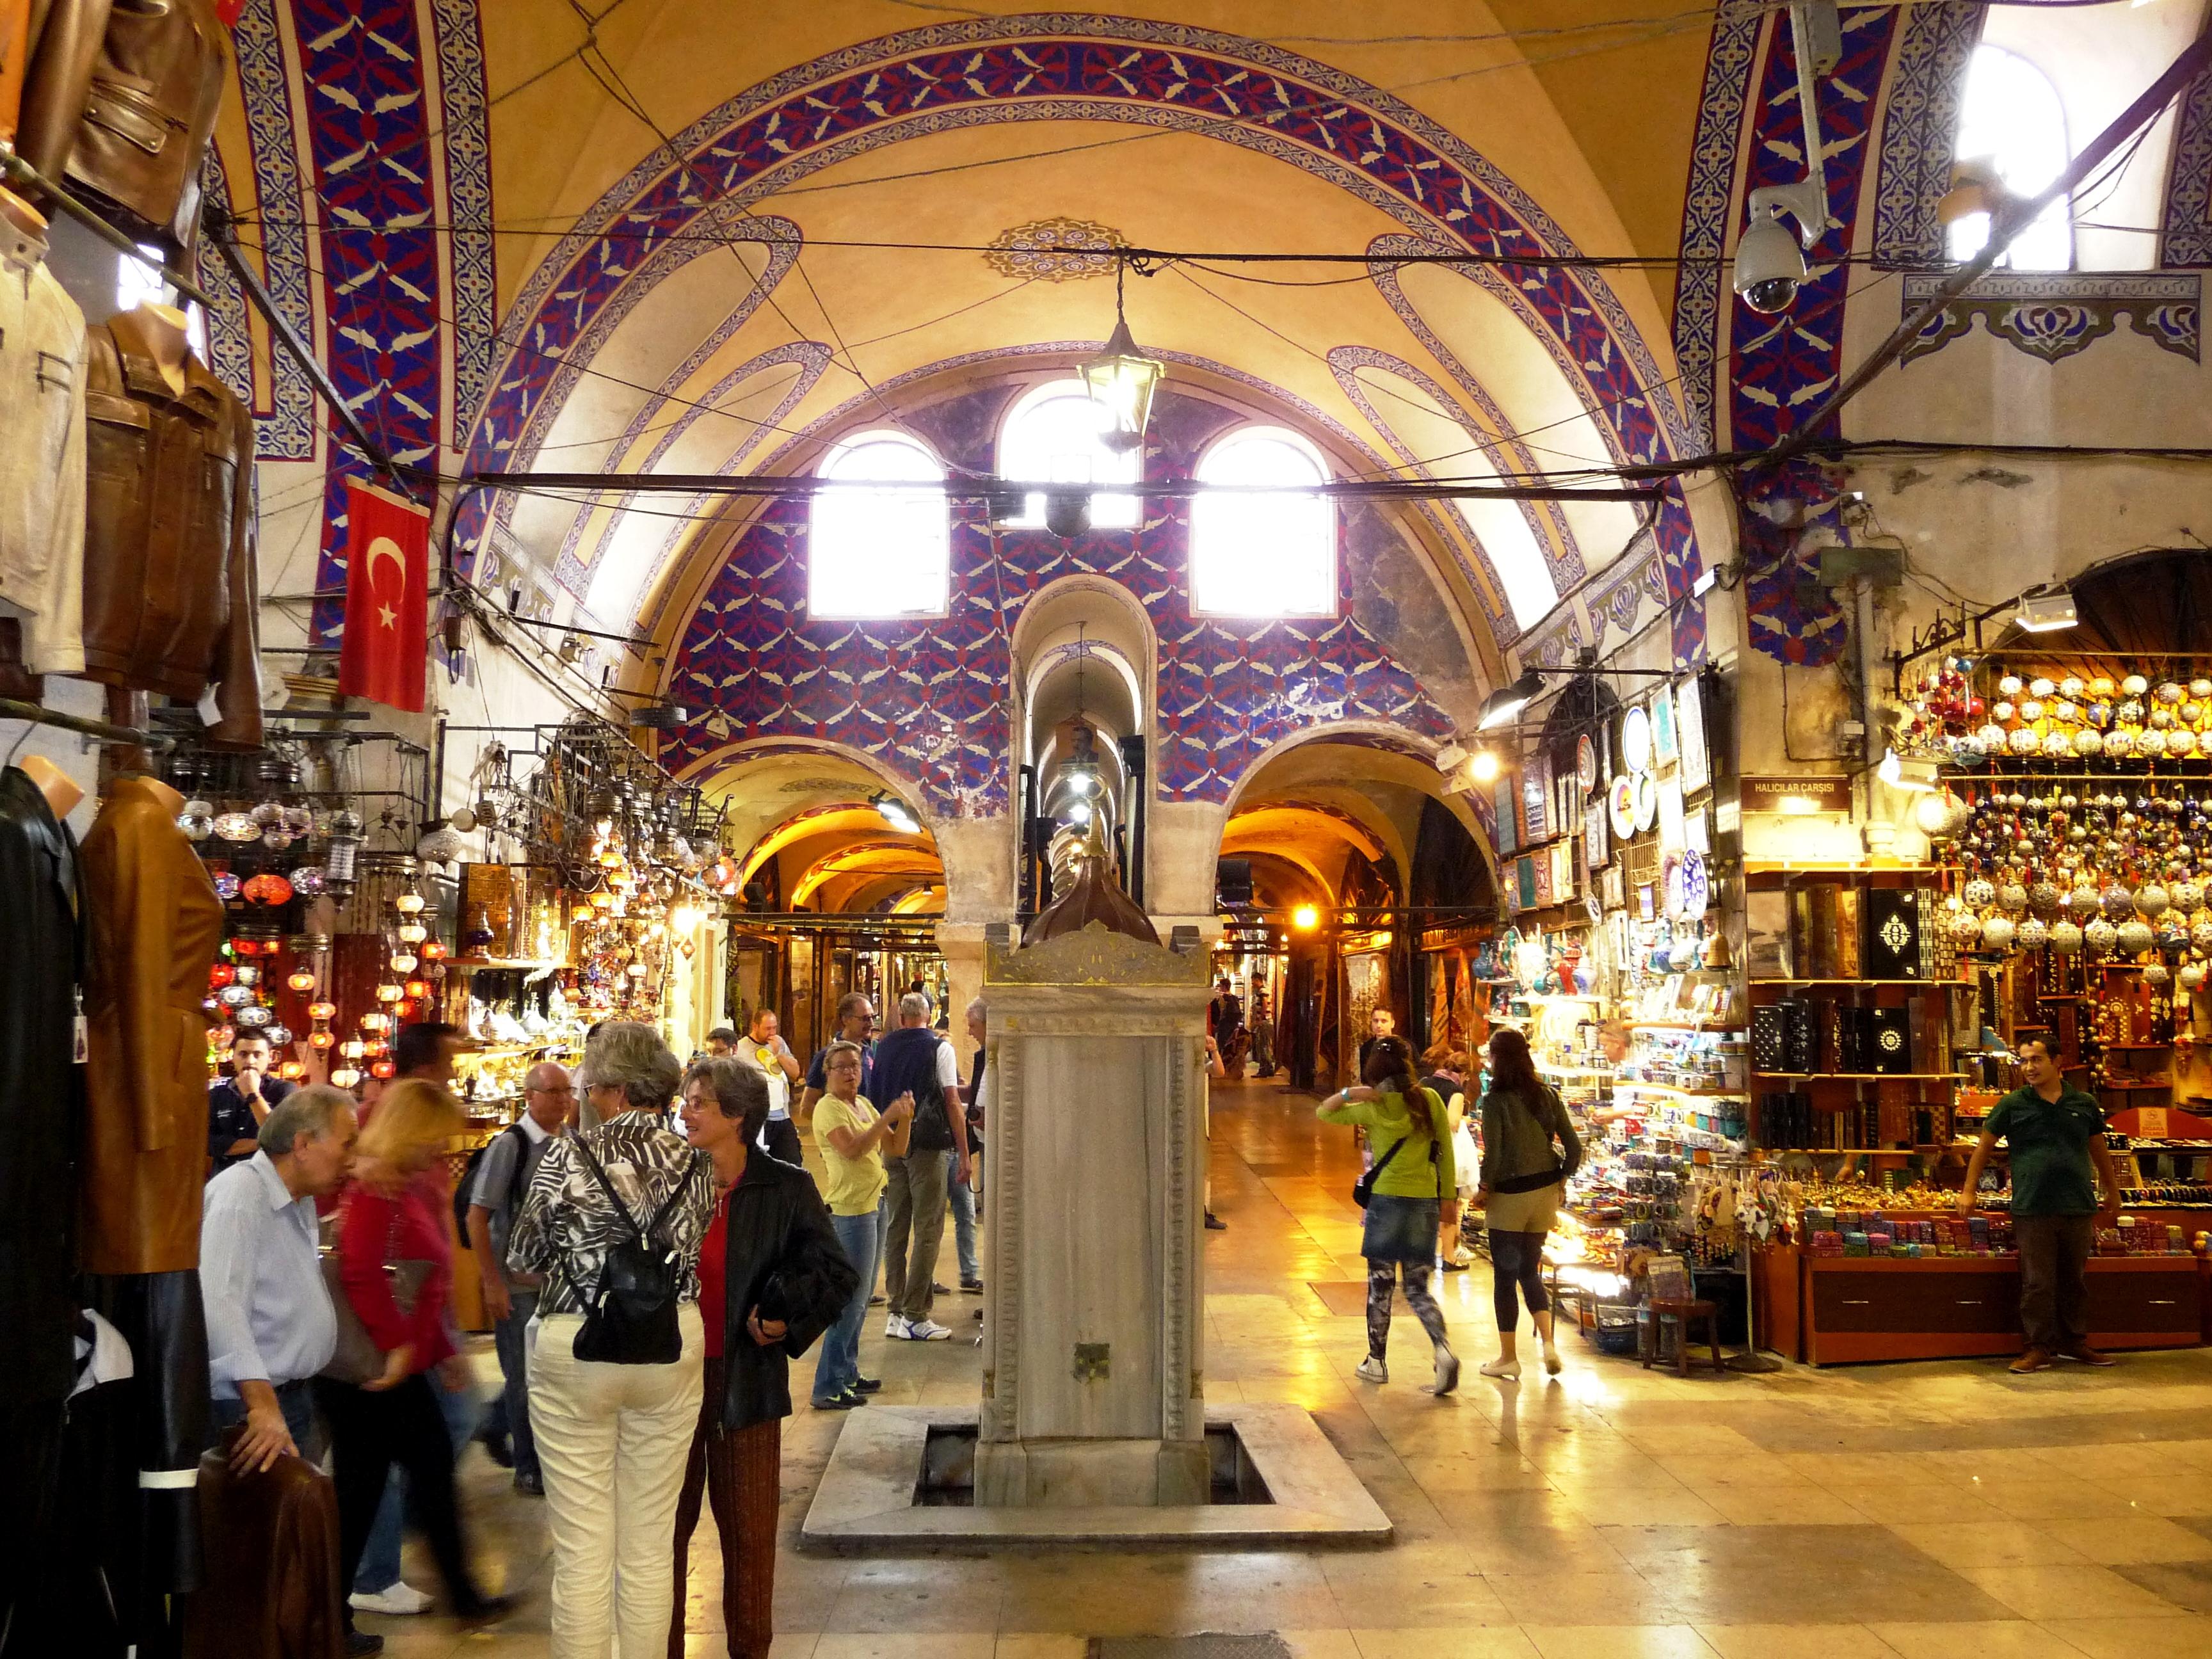 istanbul-grand-bazaar-121011-01